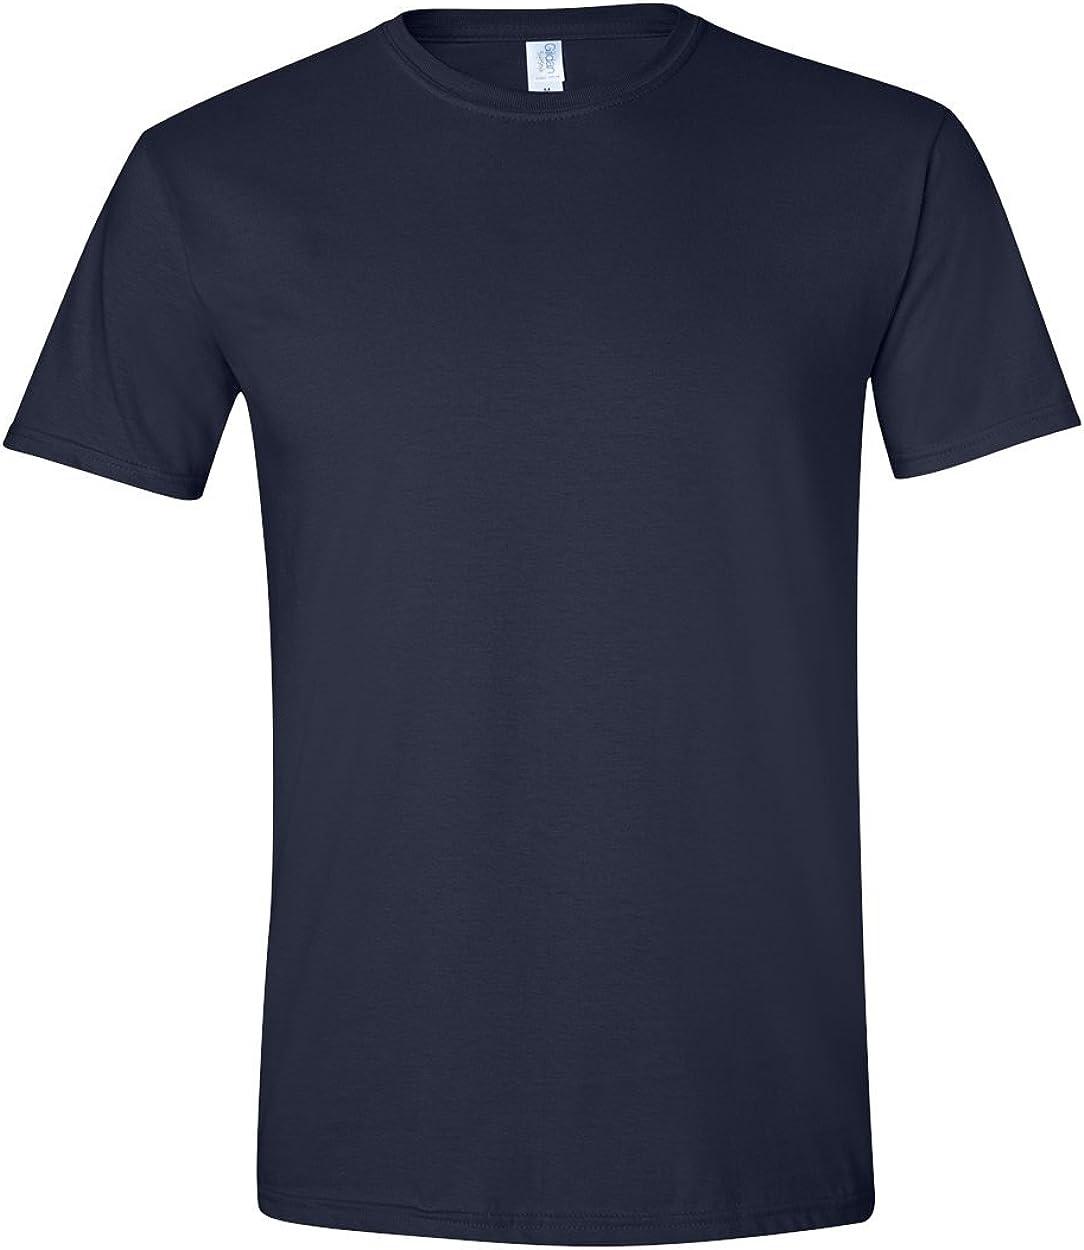 4.5 oz. T-Shirt (G640) Navy, S (Pack of 12)